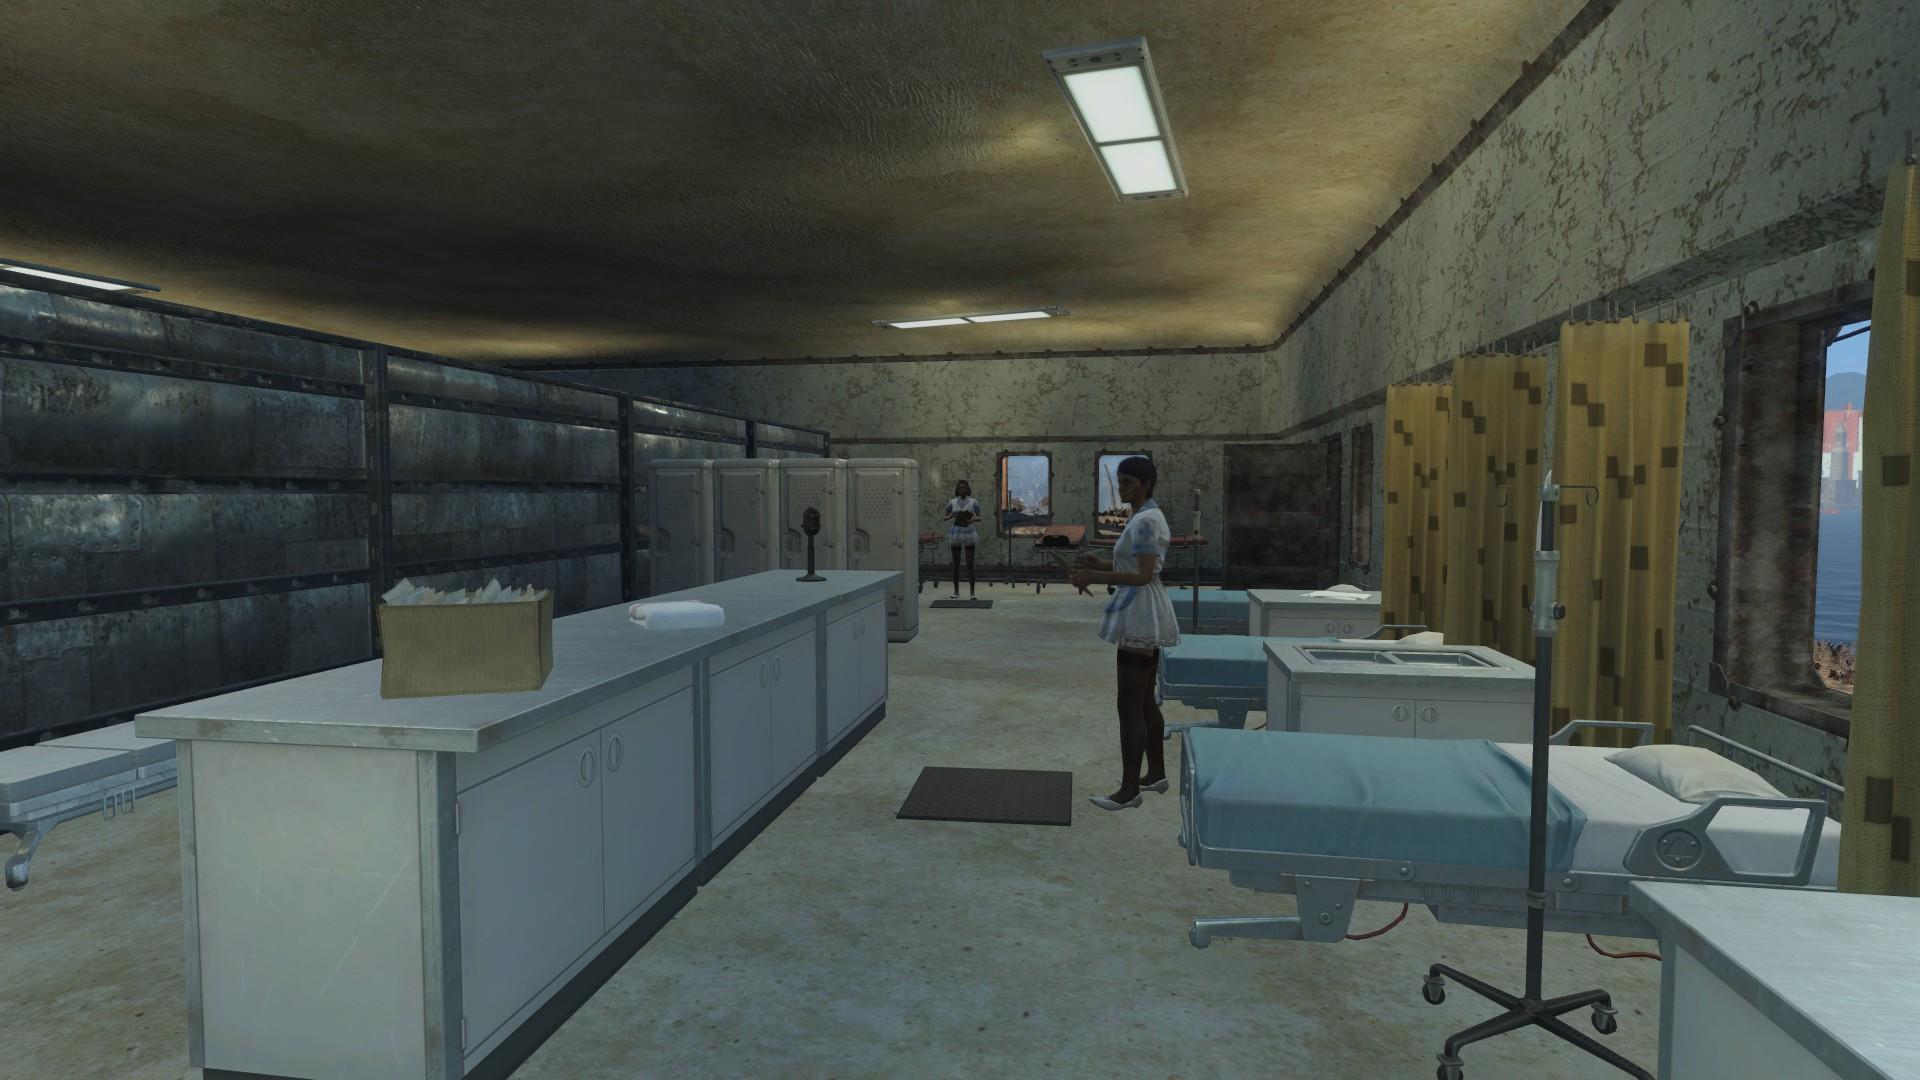 Show your Fallout 4 Settlements! E14477B619F93394C4AD70FBCA707DFB24F71734